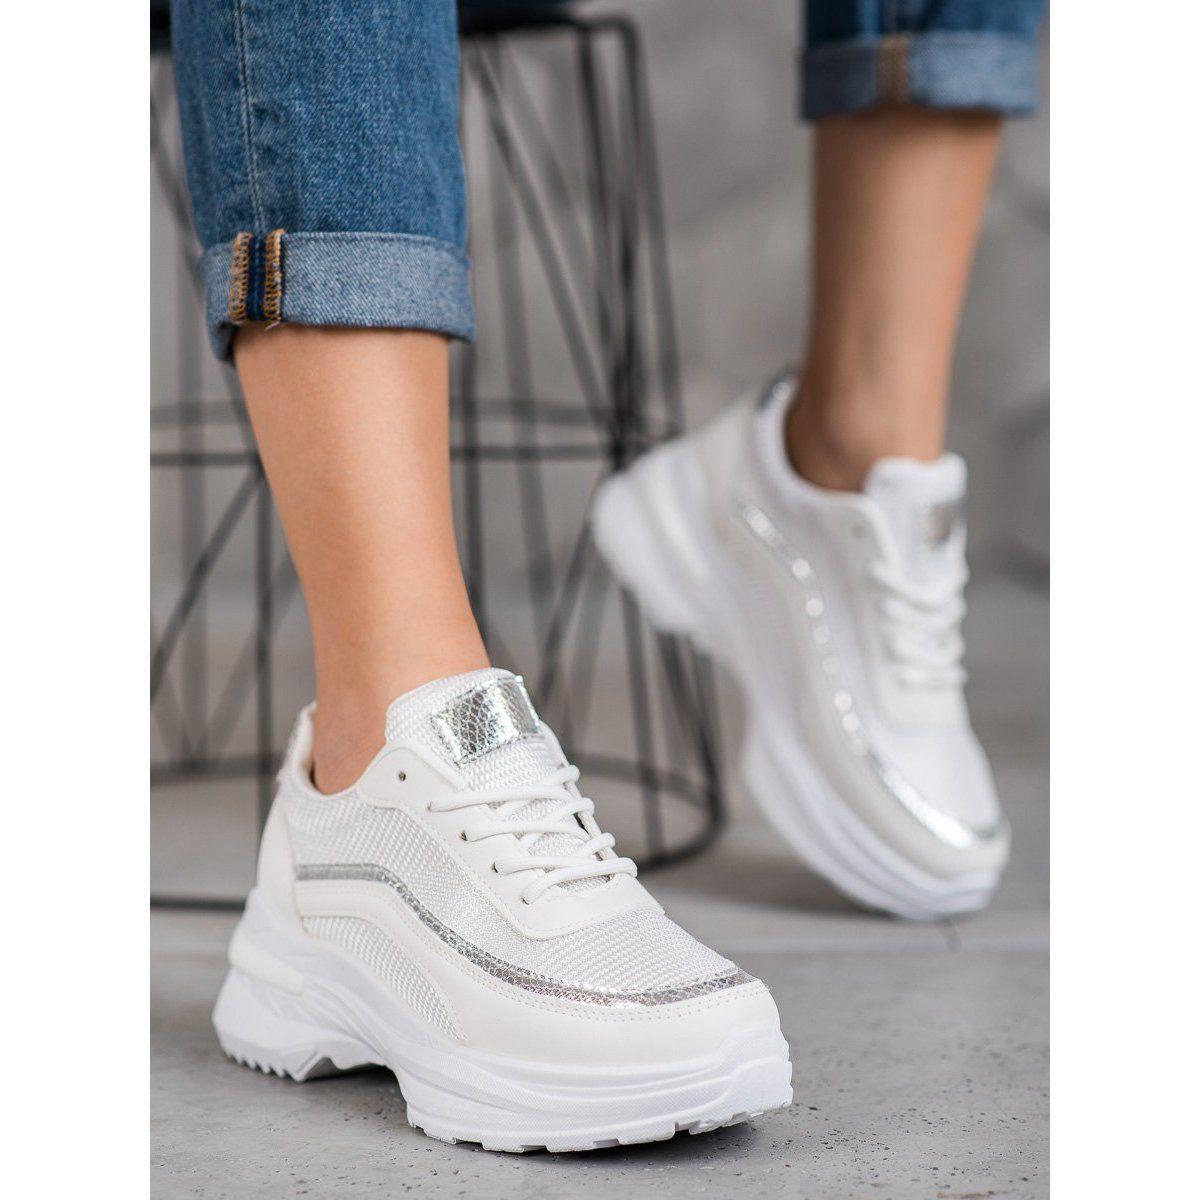 Shelovet Modne Buty Sportowe Biale Zolte Wedding Sneaker Air Max Sneakers Shoes